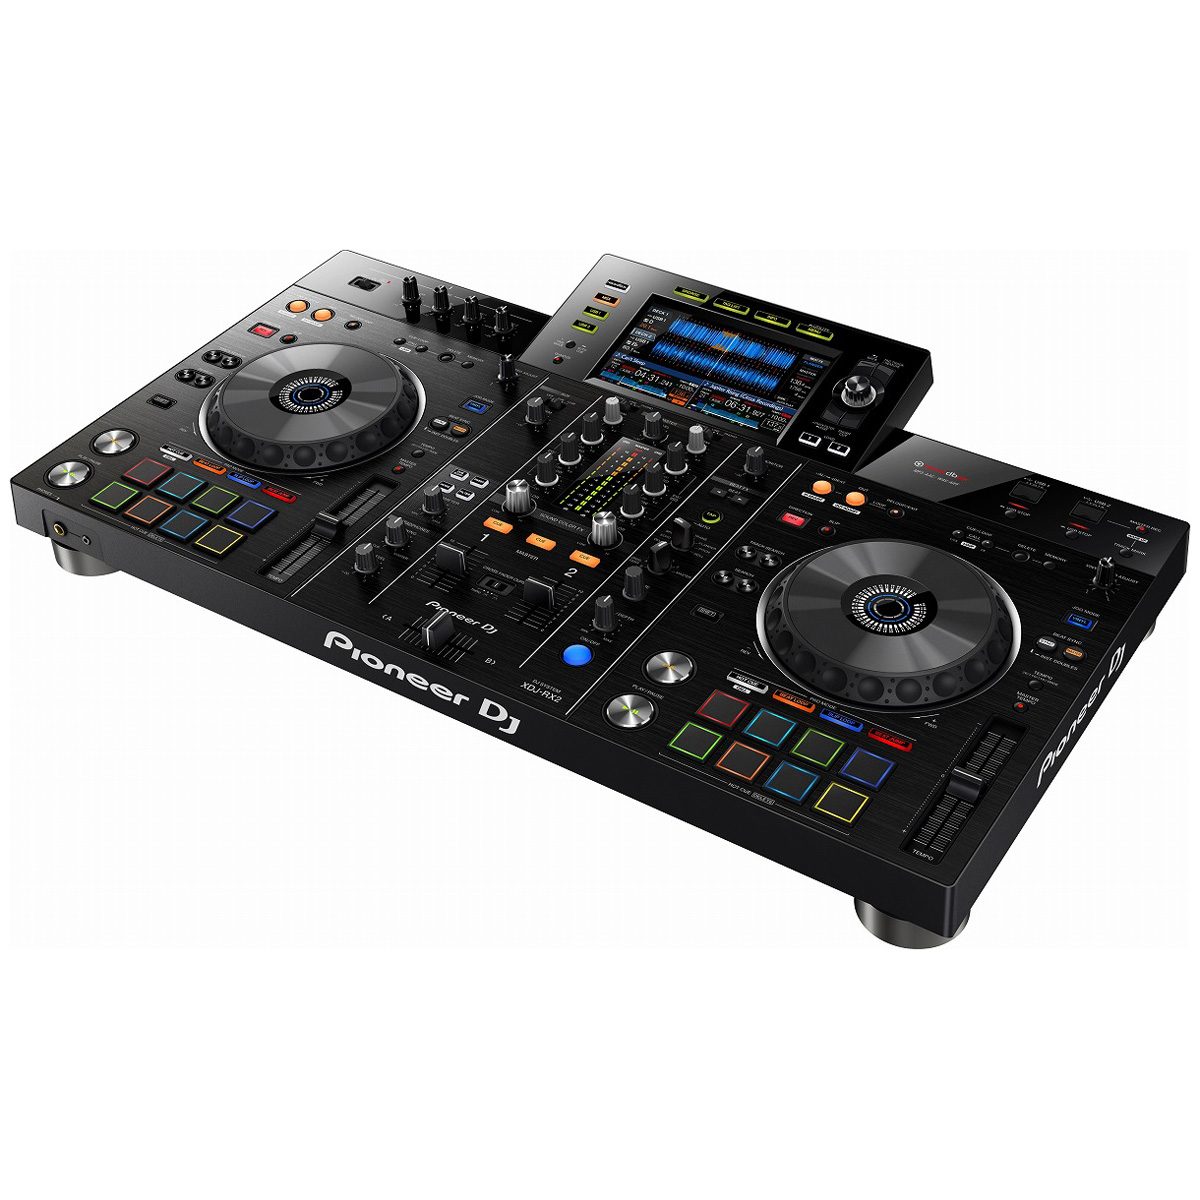 PIONEER DJ / XDJ-RX2 一体型DJシステム【限定特典付き!】 【お取り寄せ商品】【渋谷店】